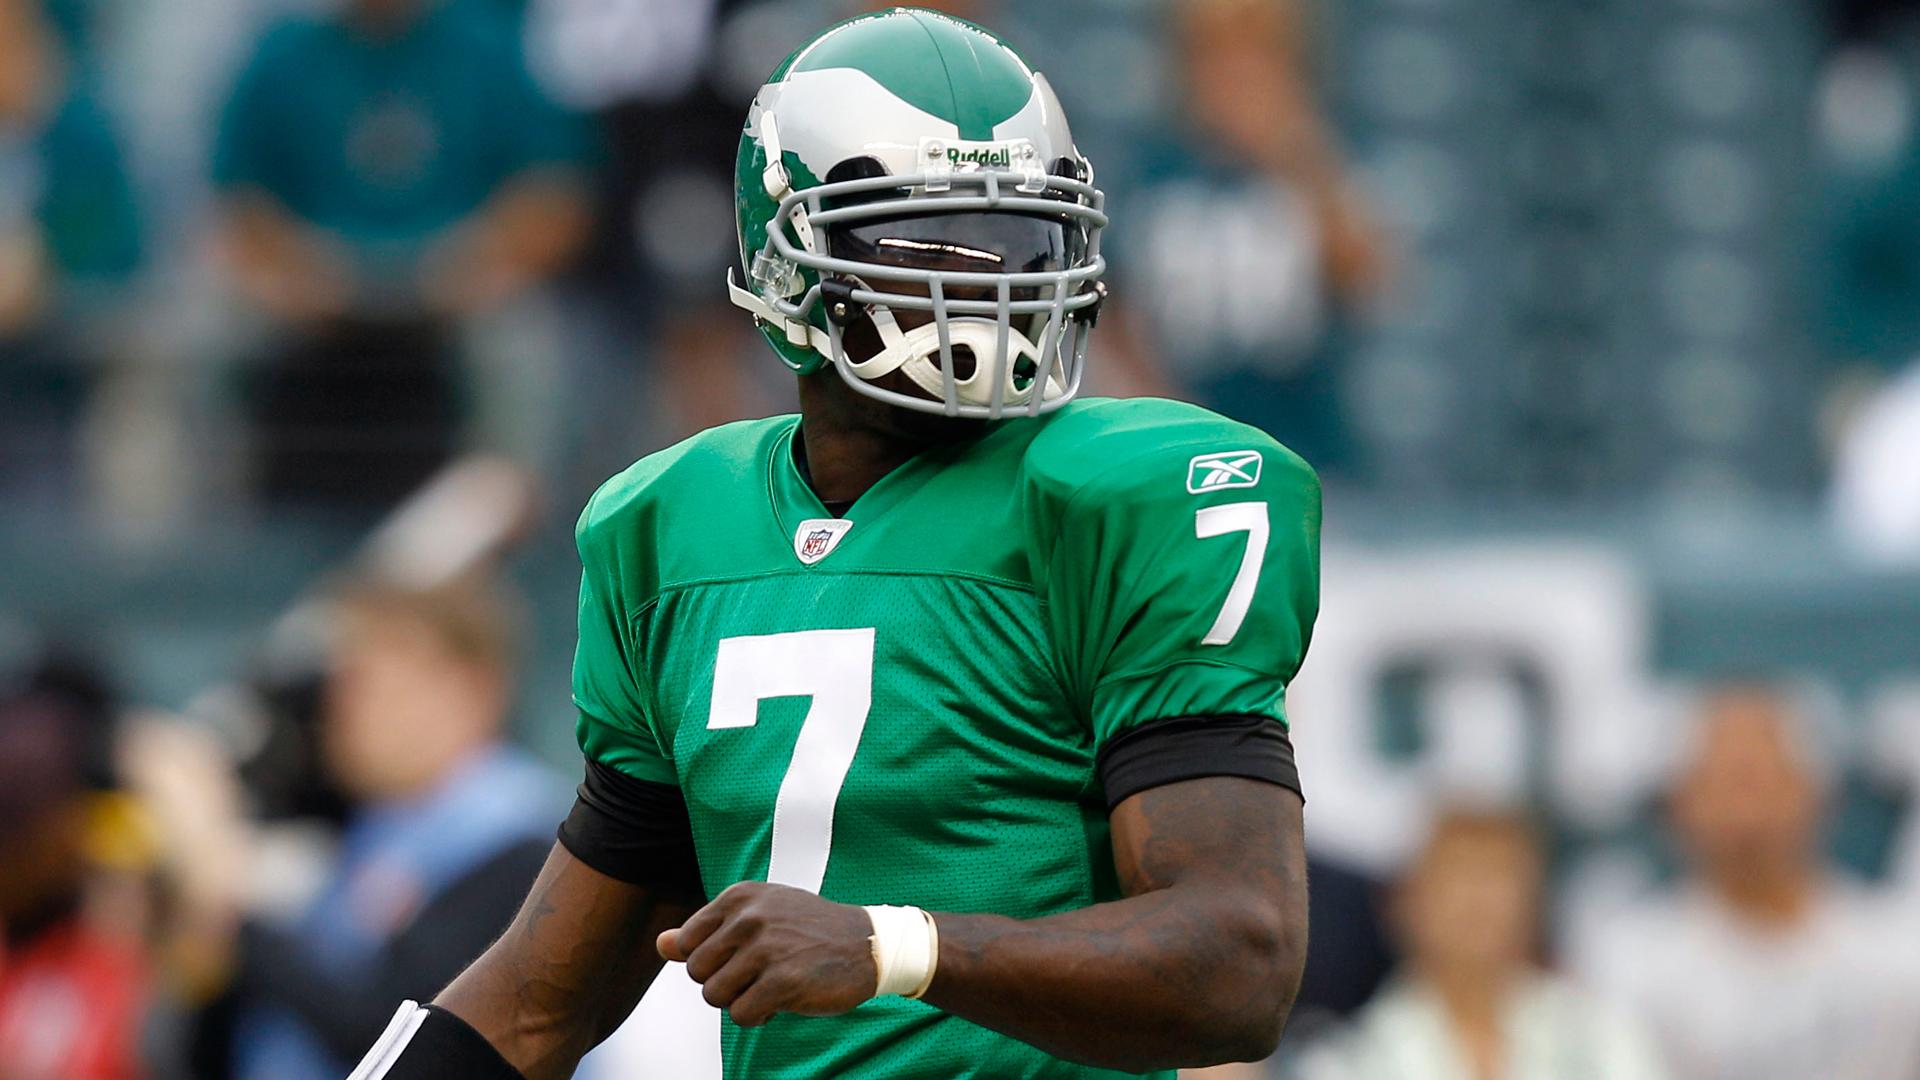 philadelphia eagles kelly green jersey HIS LLC